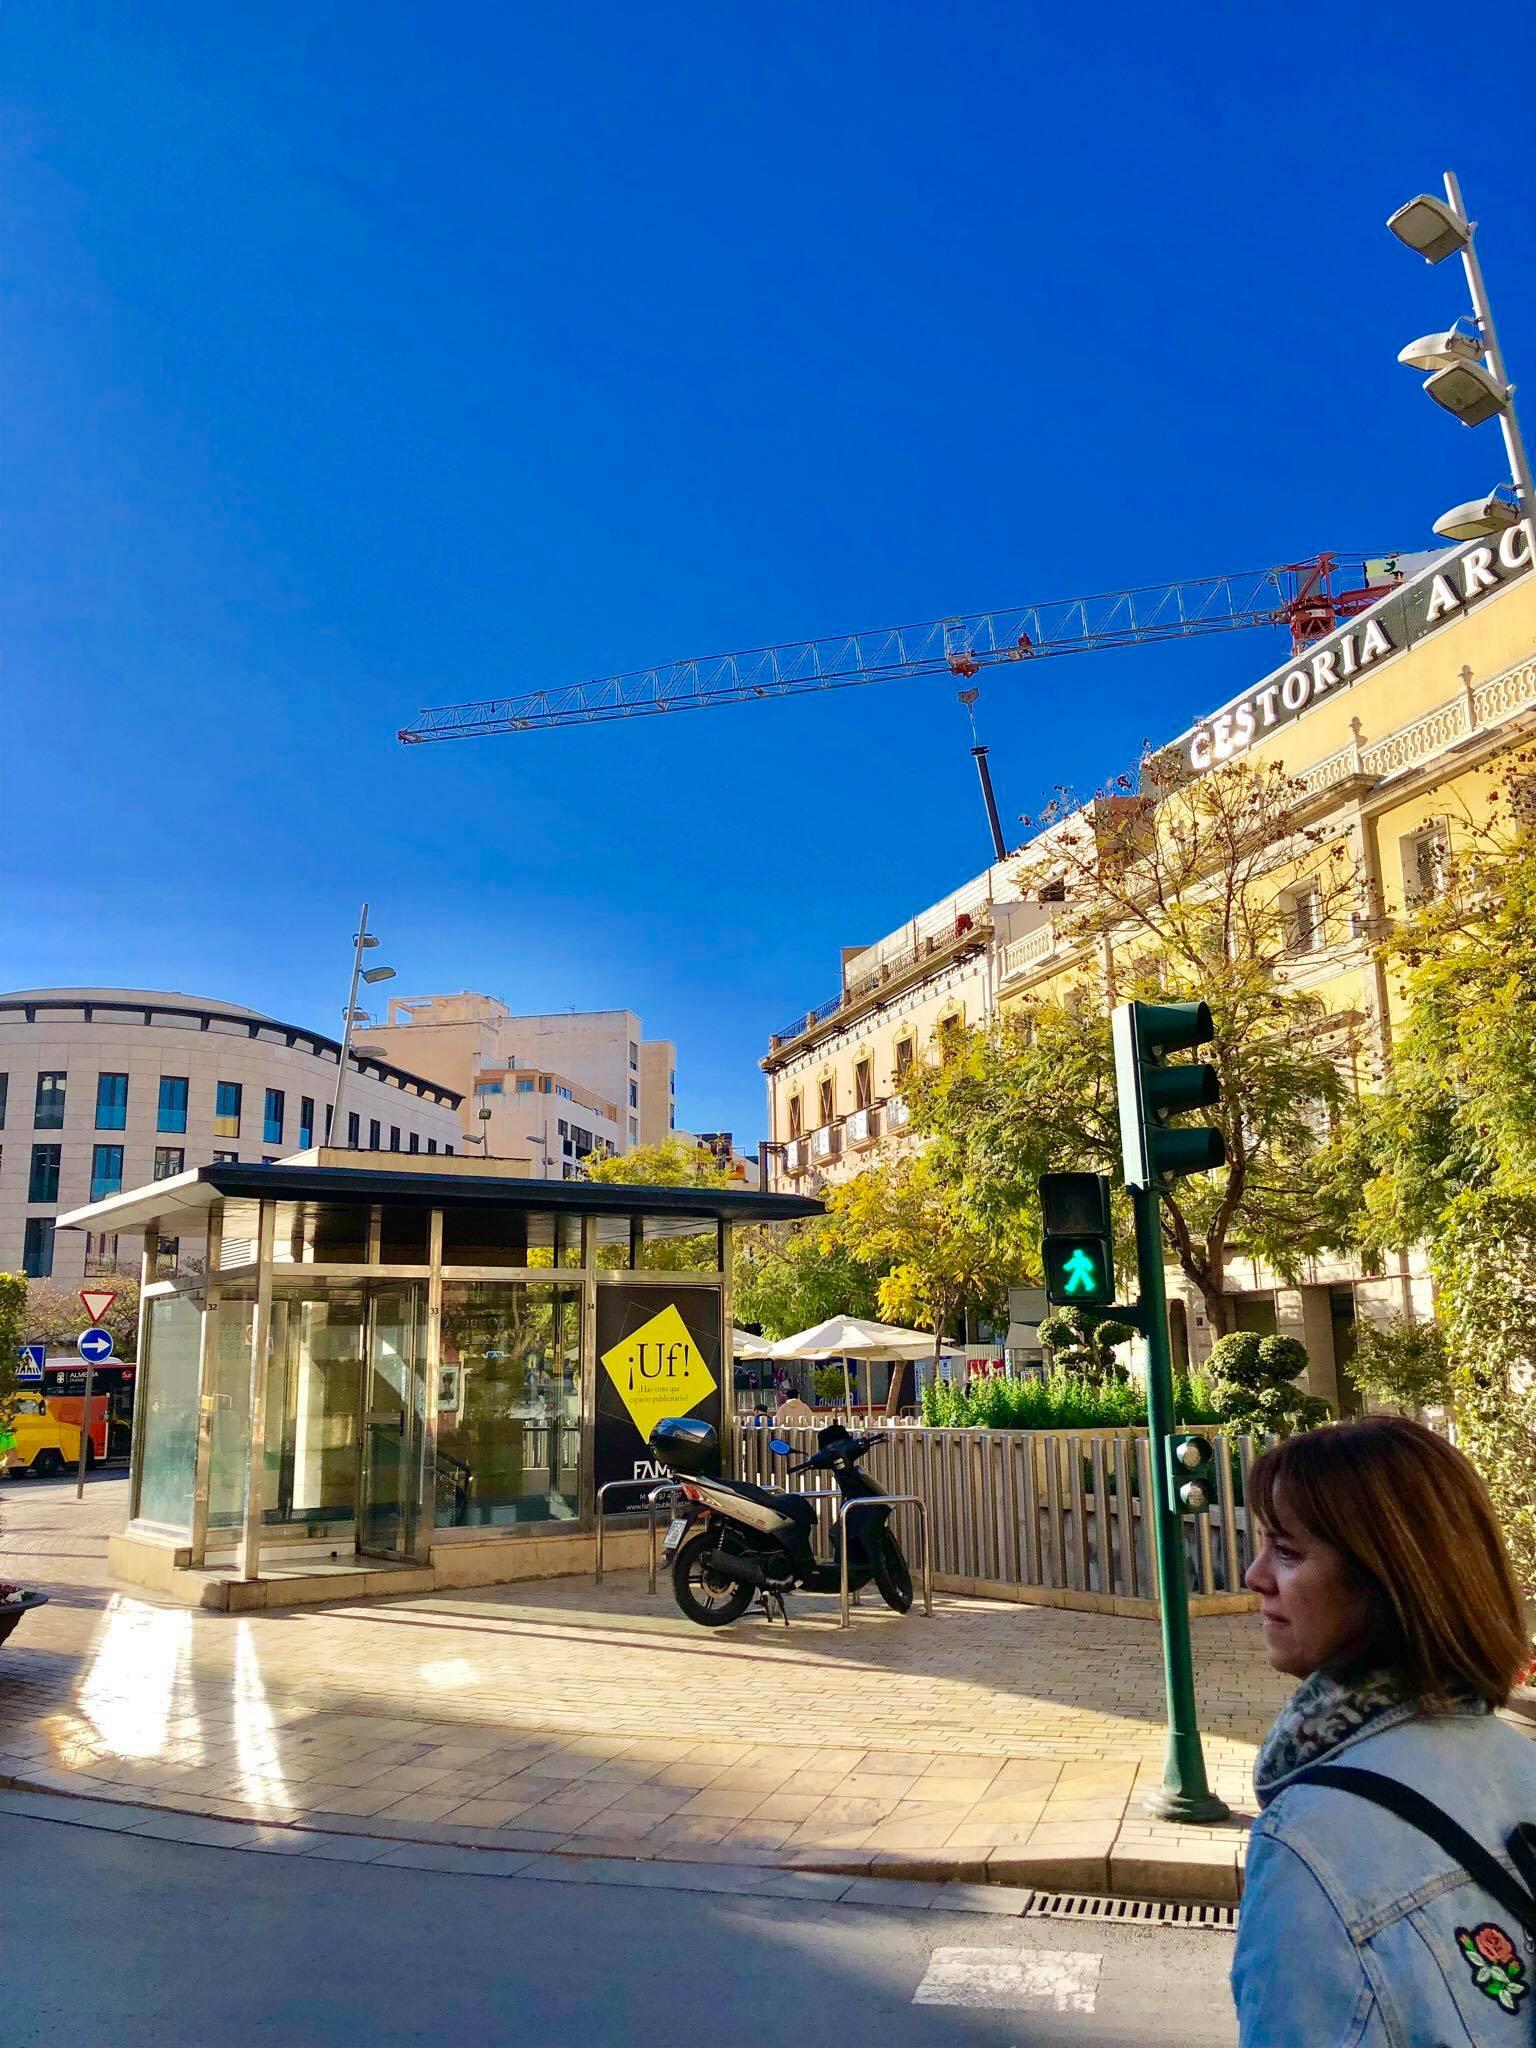 Kach Solo Travels in 2019 Thanks to Cámara de Comercio de Almería5.jpg